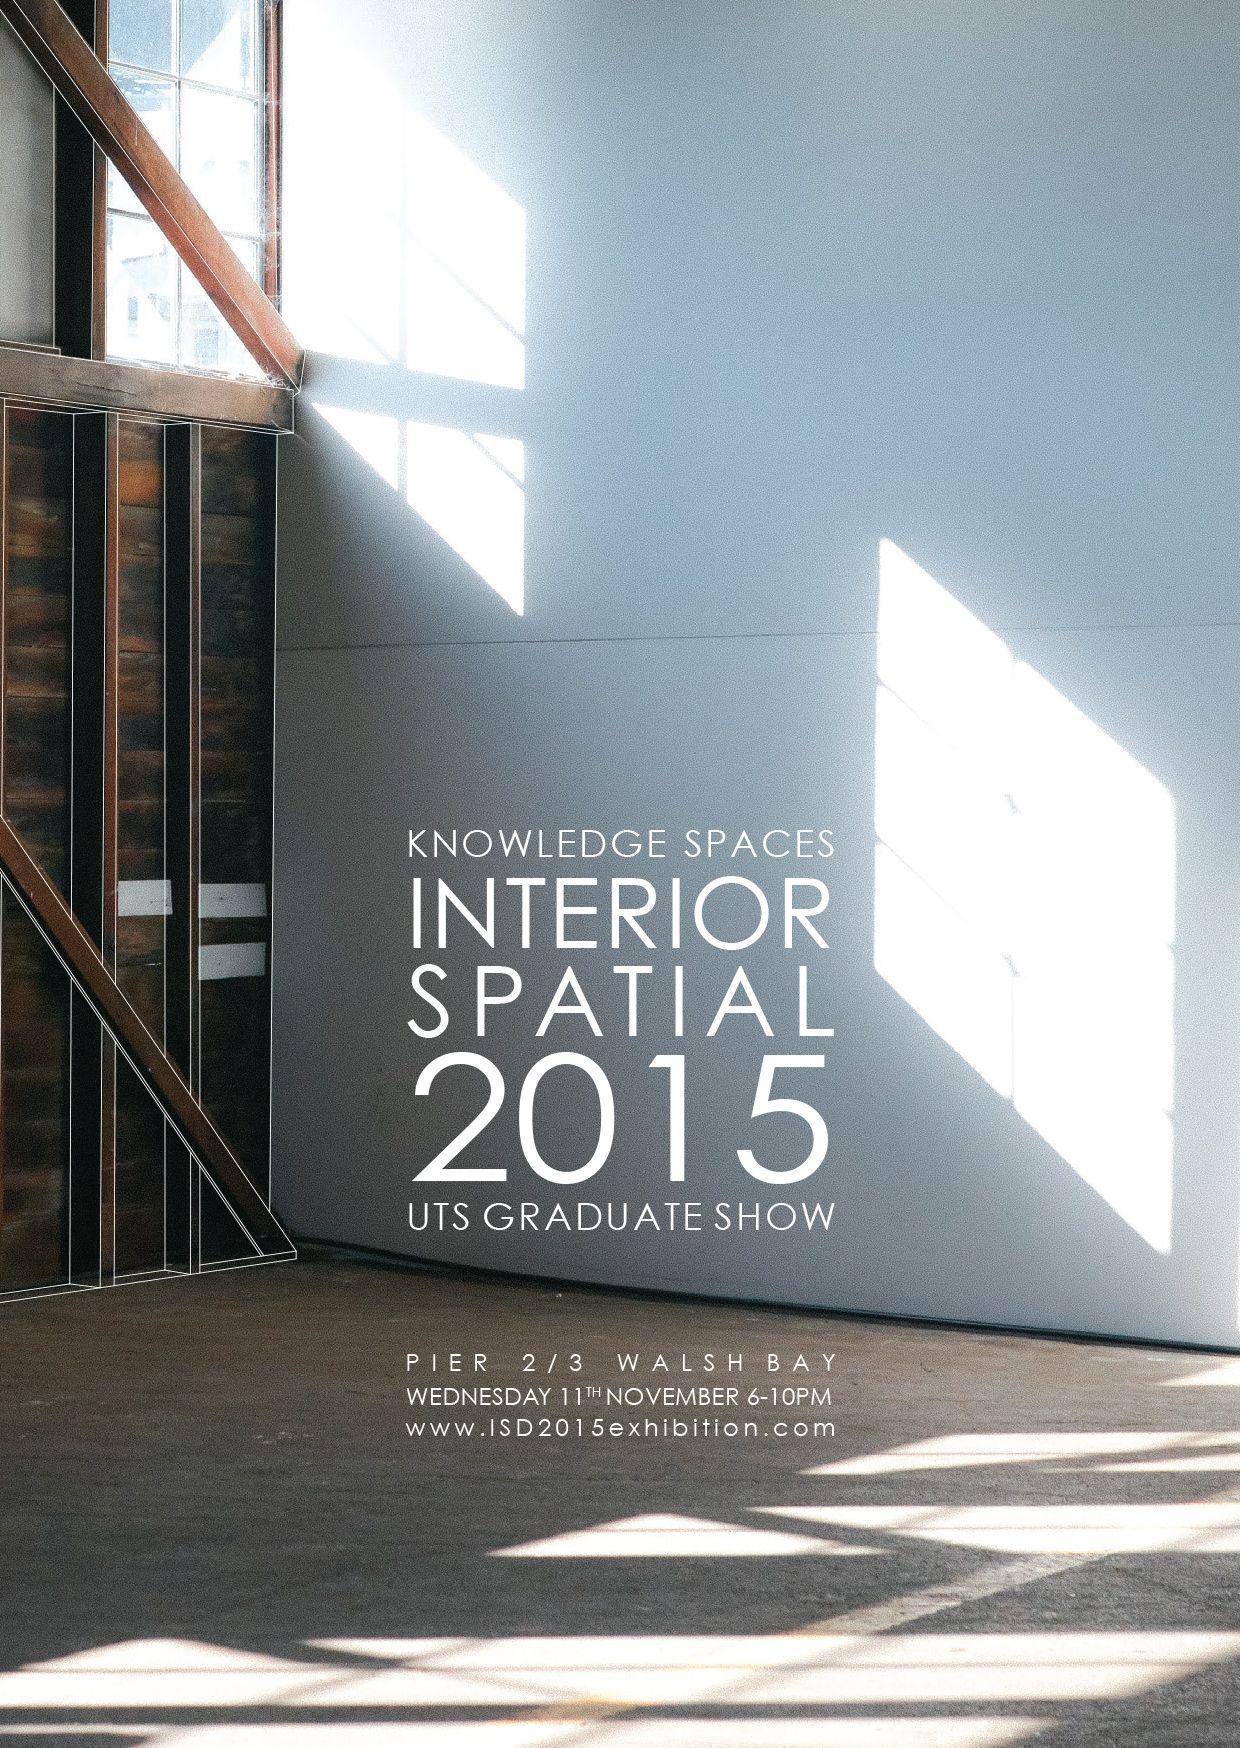 Interior Spatial 2015 UTS Graduate Show Knowledge Spaces